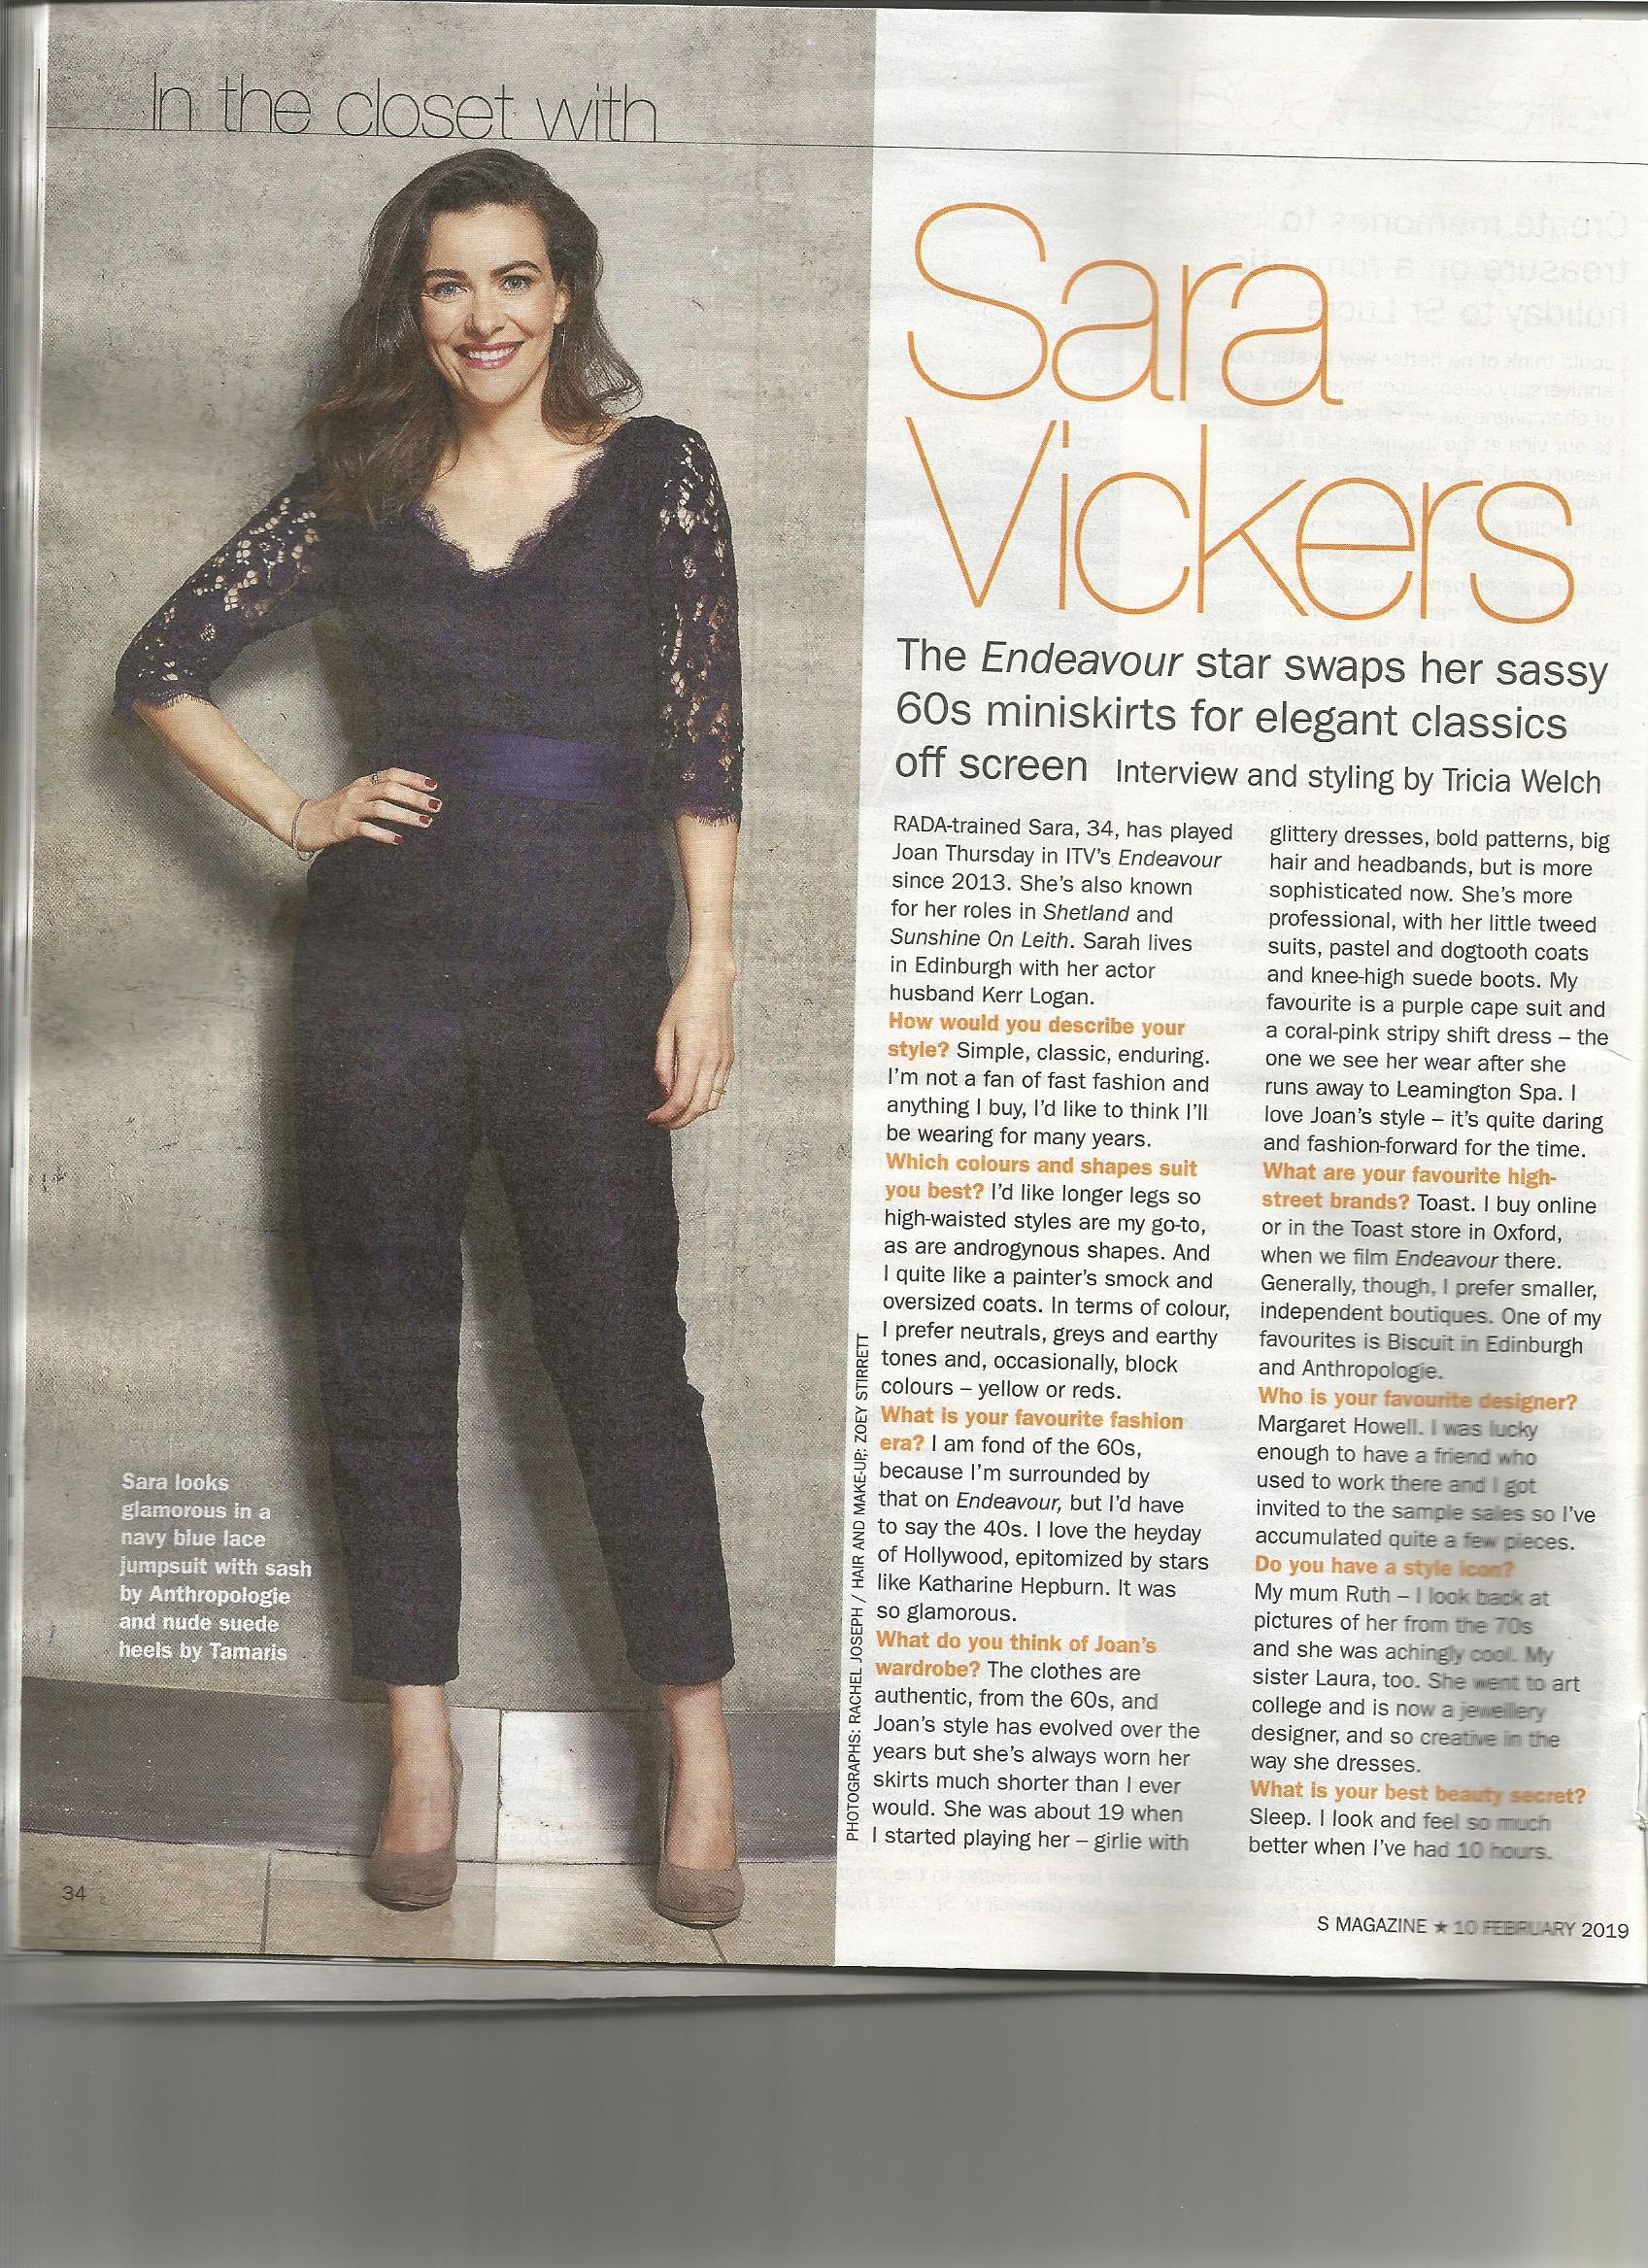 Sara Vickers instagram